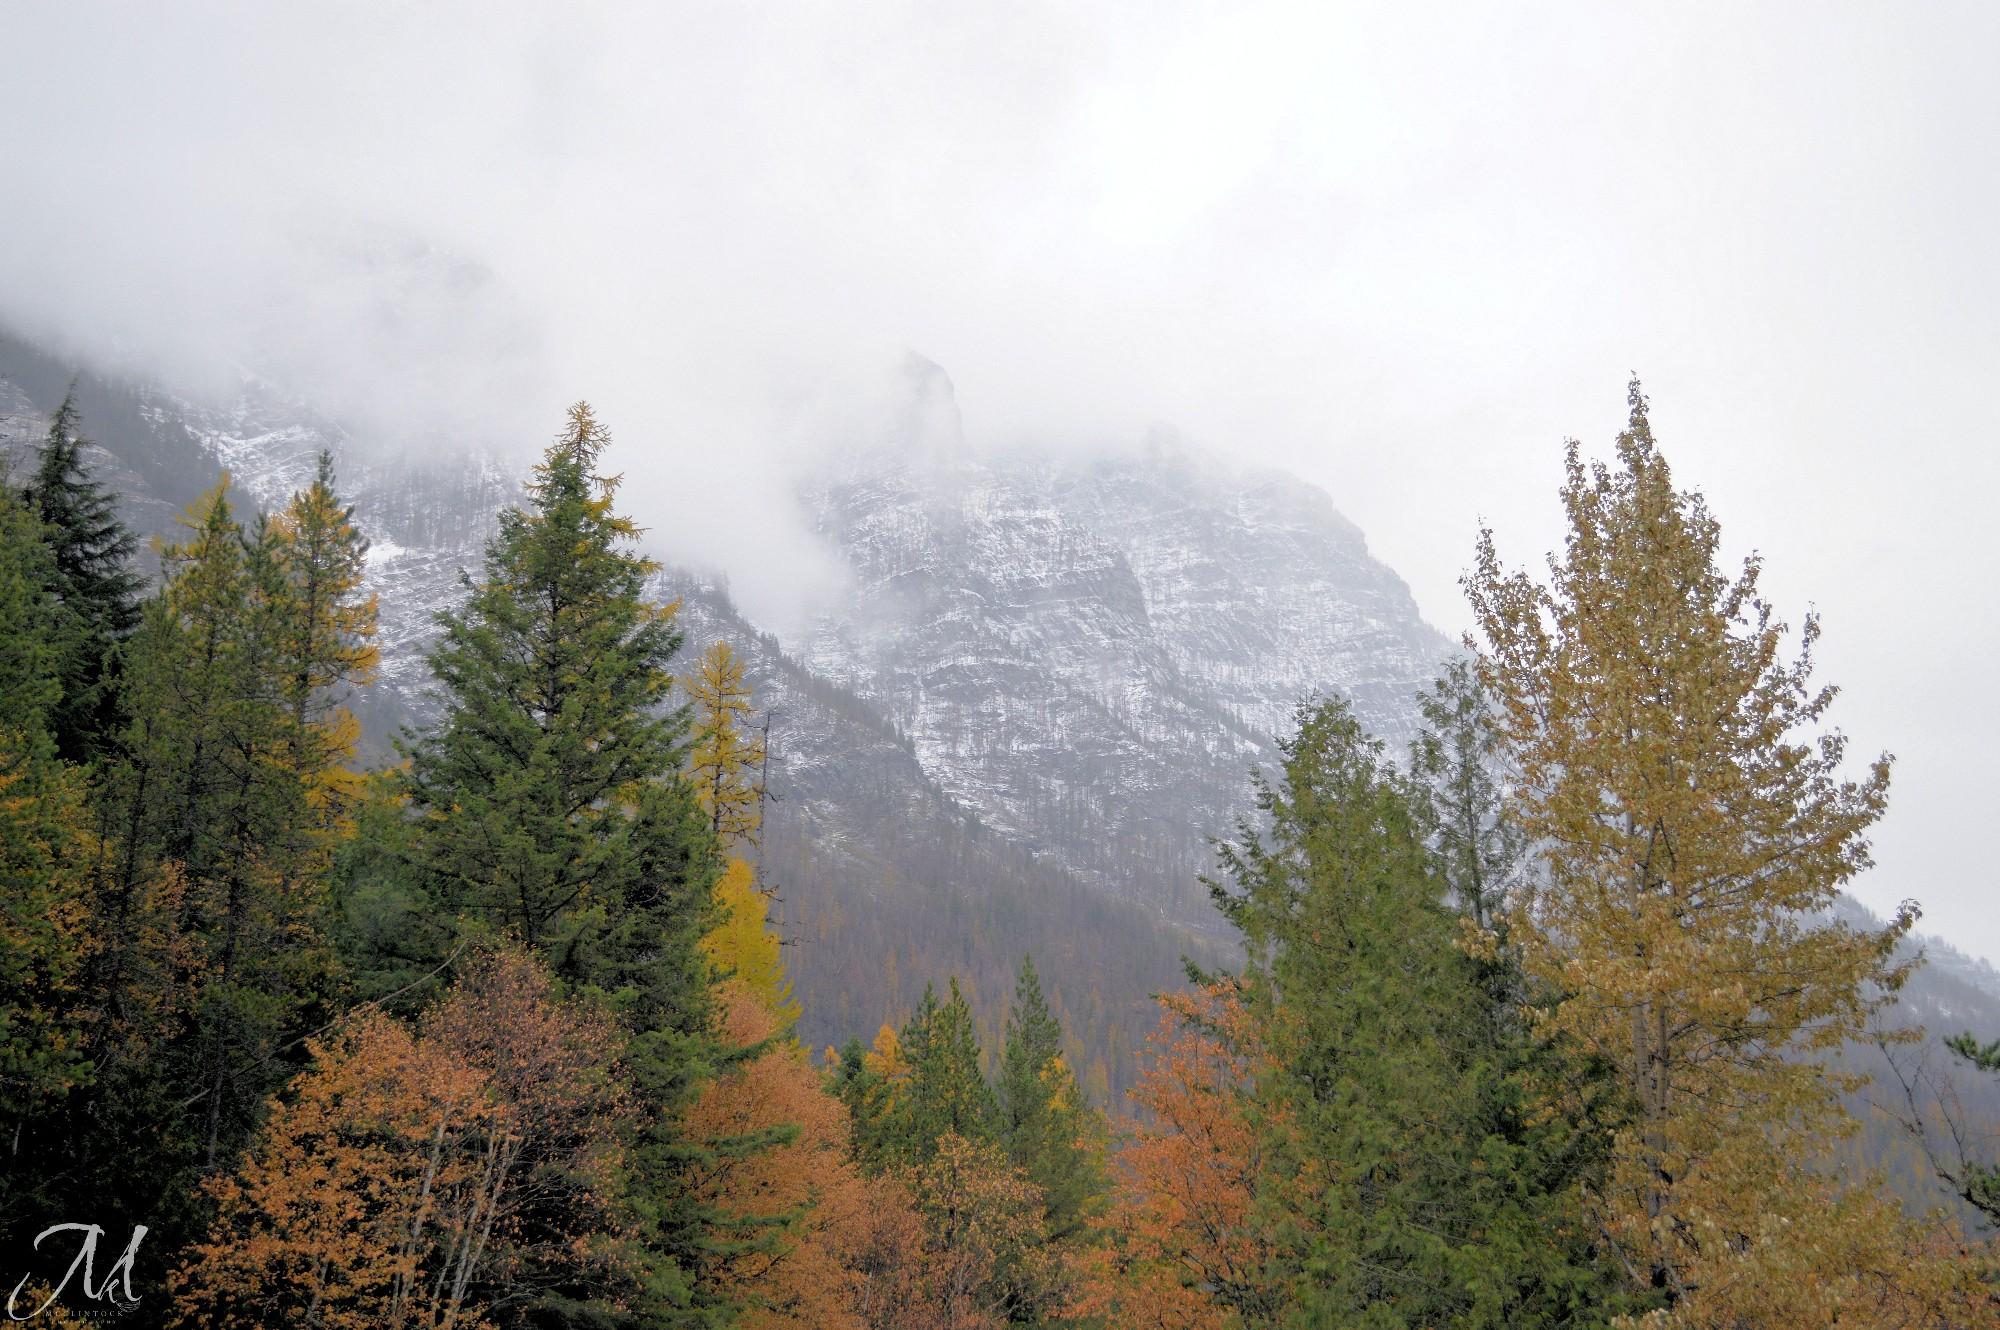 October Rain in Glacier National Park_MKMcClintock | #photography #GlacierPark #mountains #autumn